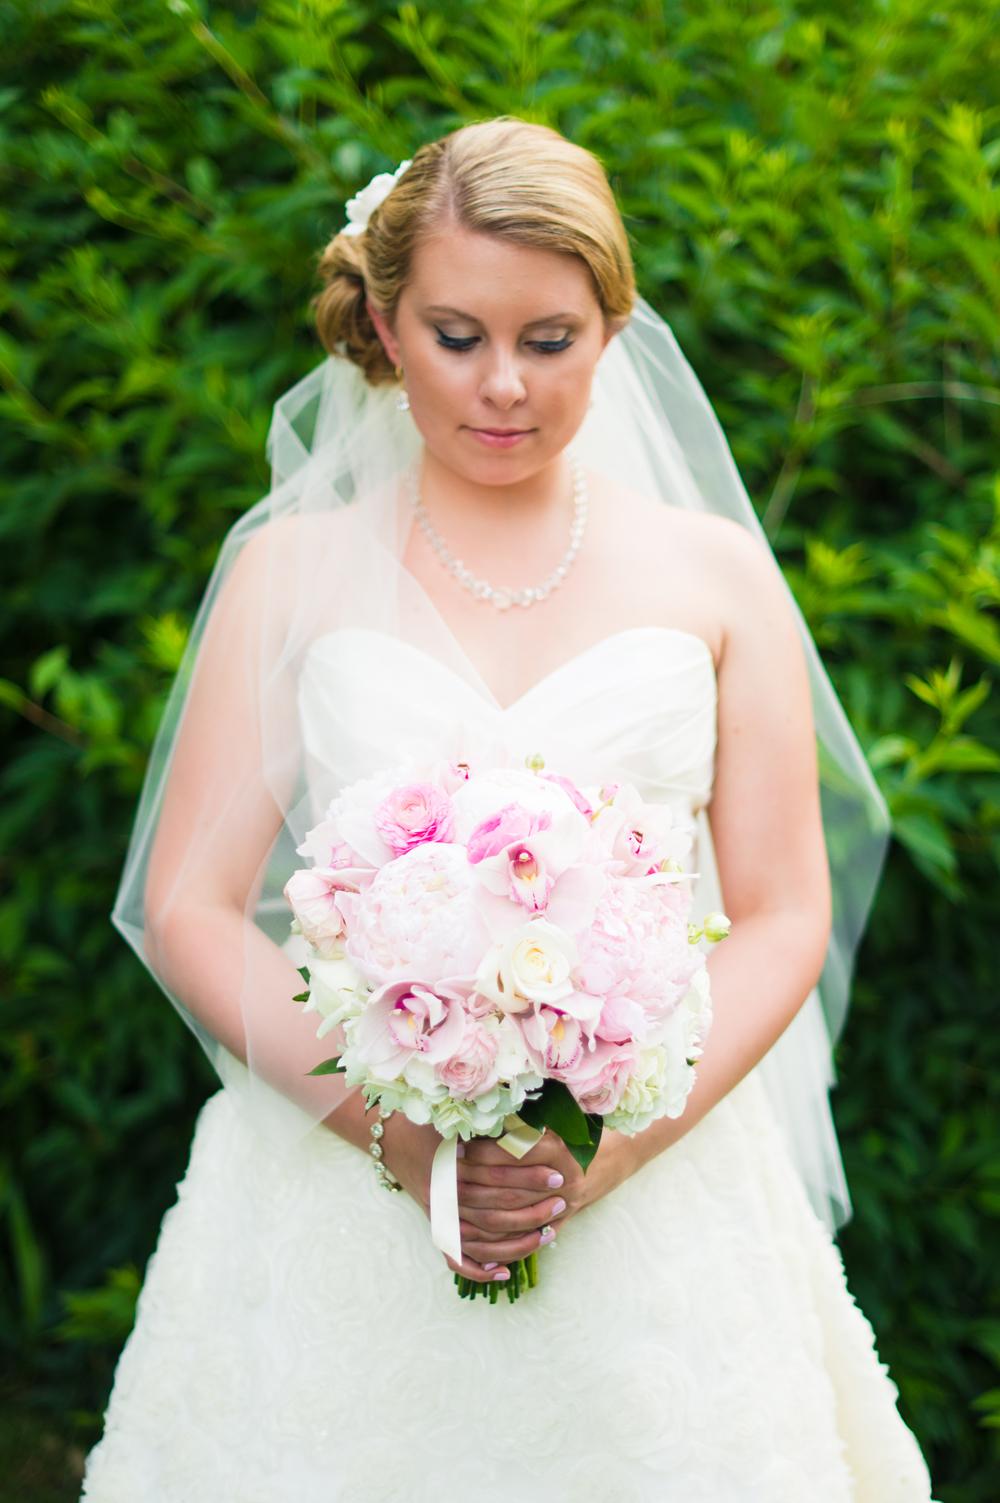 Tarrywile-Mansion-Wedding-Greg-Lewis-Photo-72